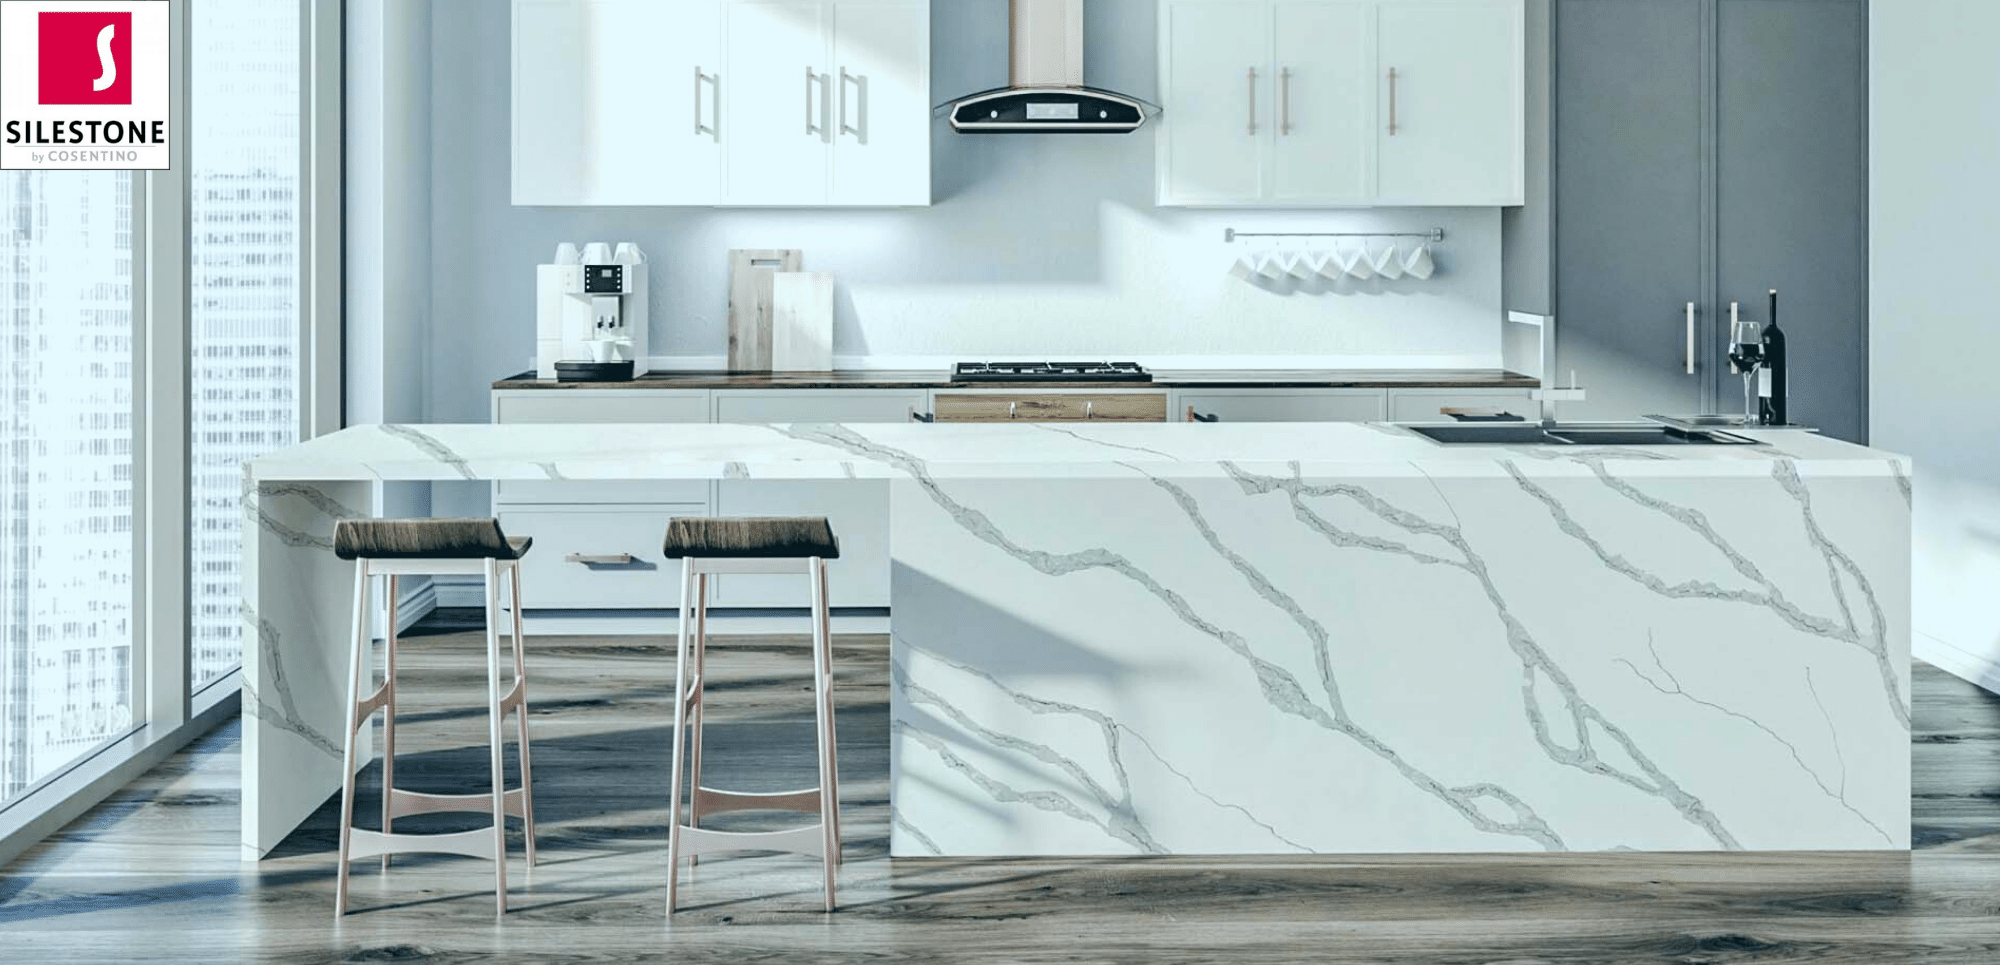 Silestone Bianco Calacatta Quartz Countertops Silestone vs Granite